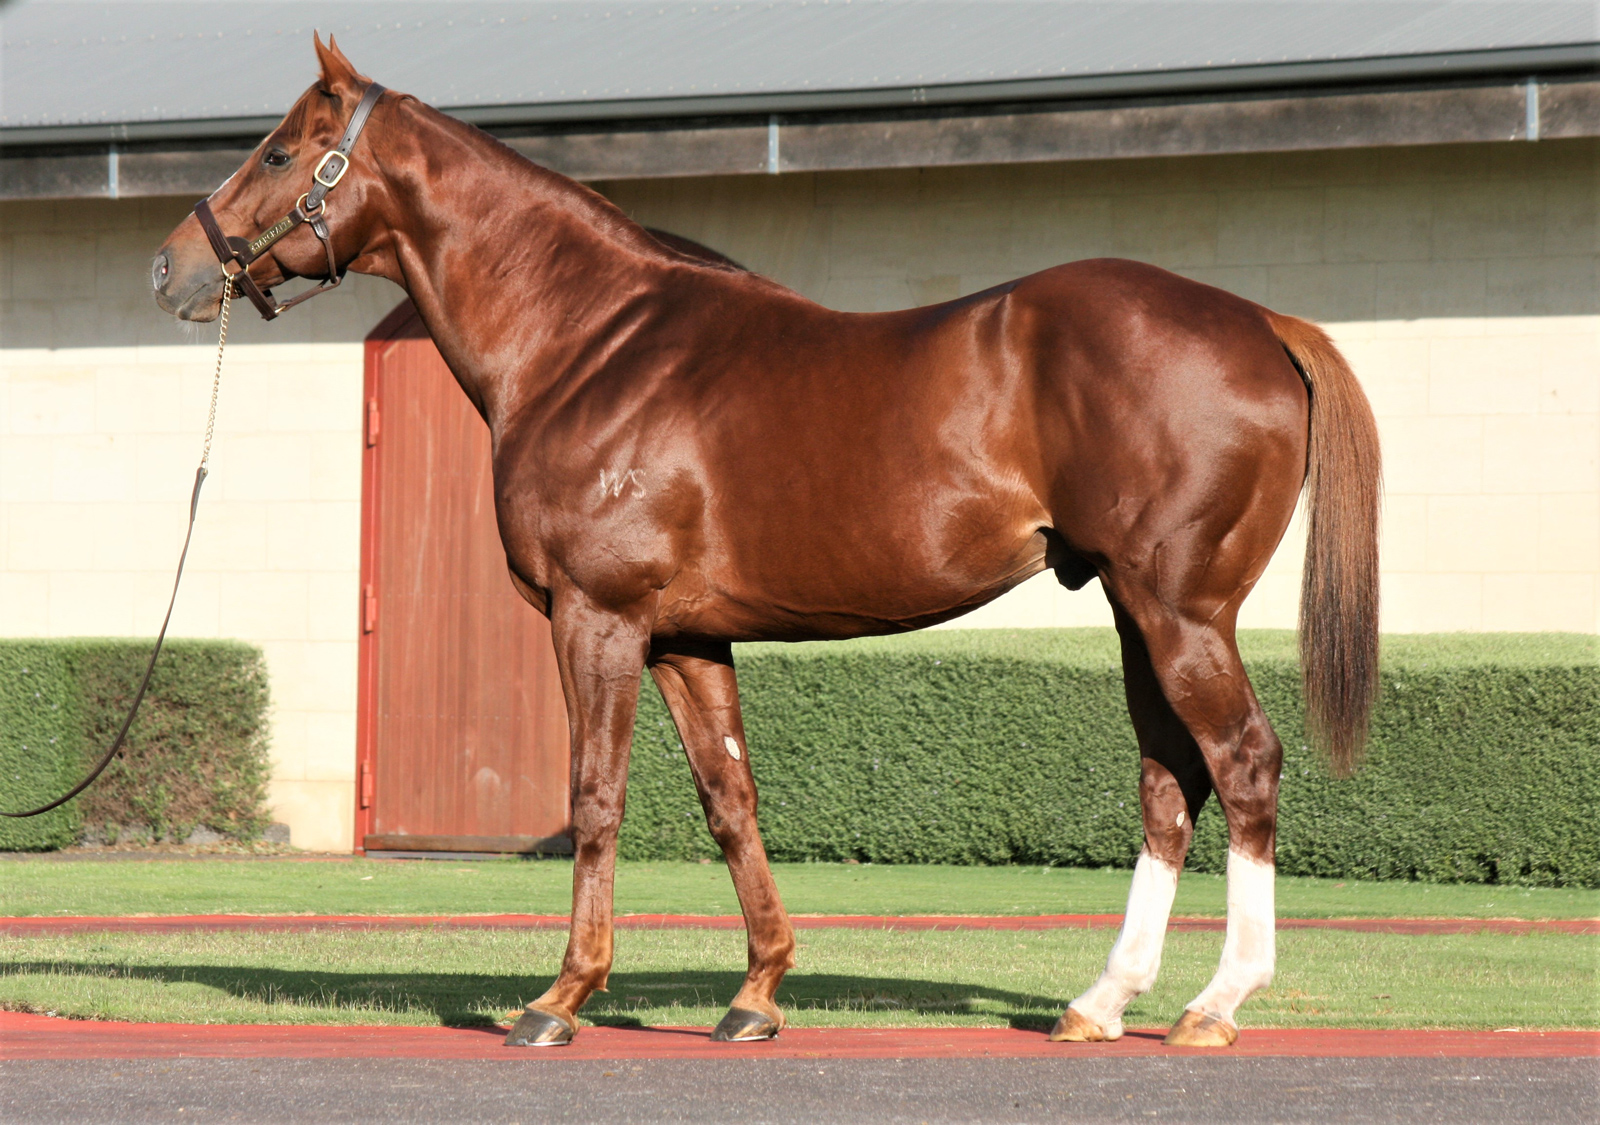 http://www.stallions.com.au/wp-content/uploads/2019/10/102381715.jpg